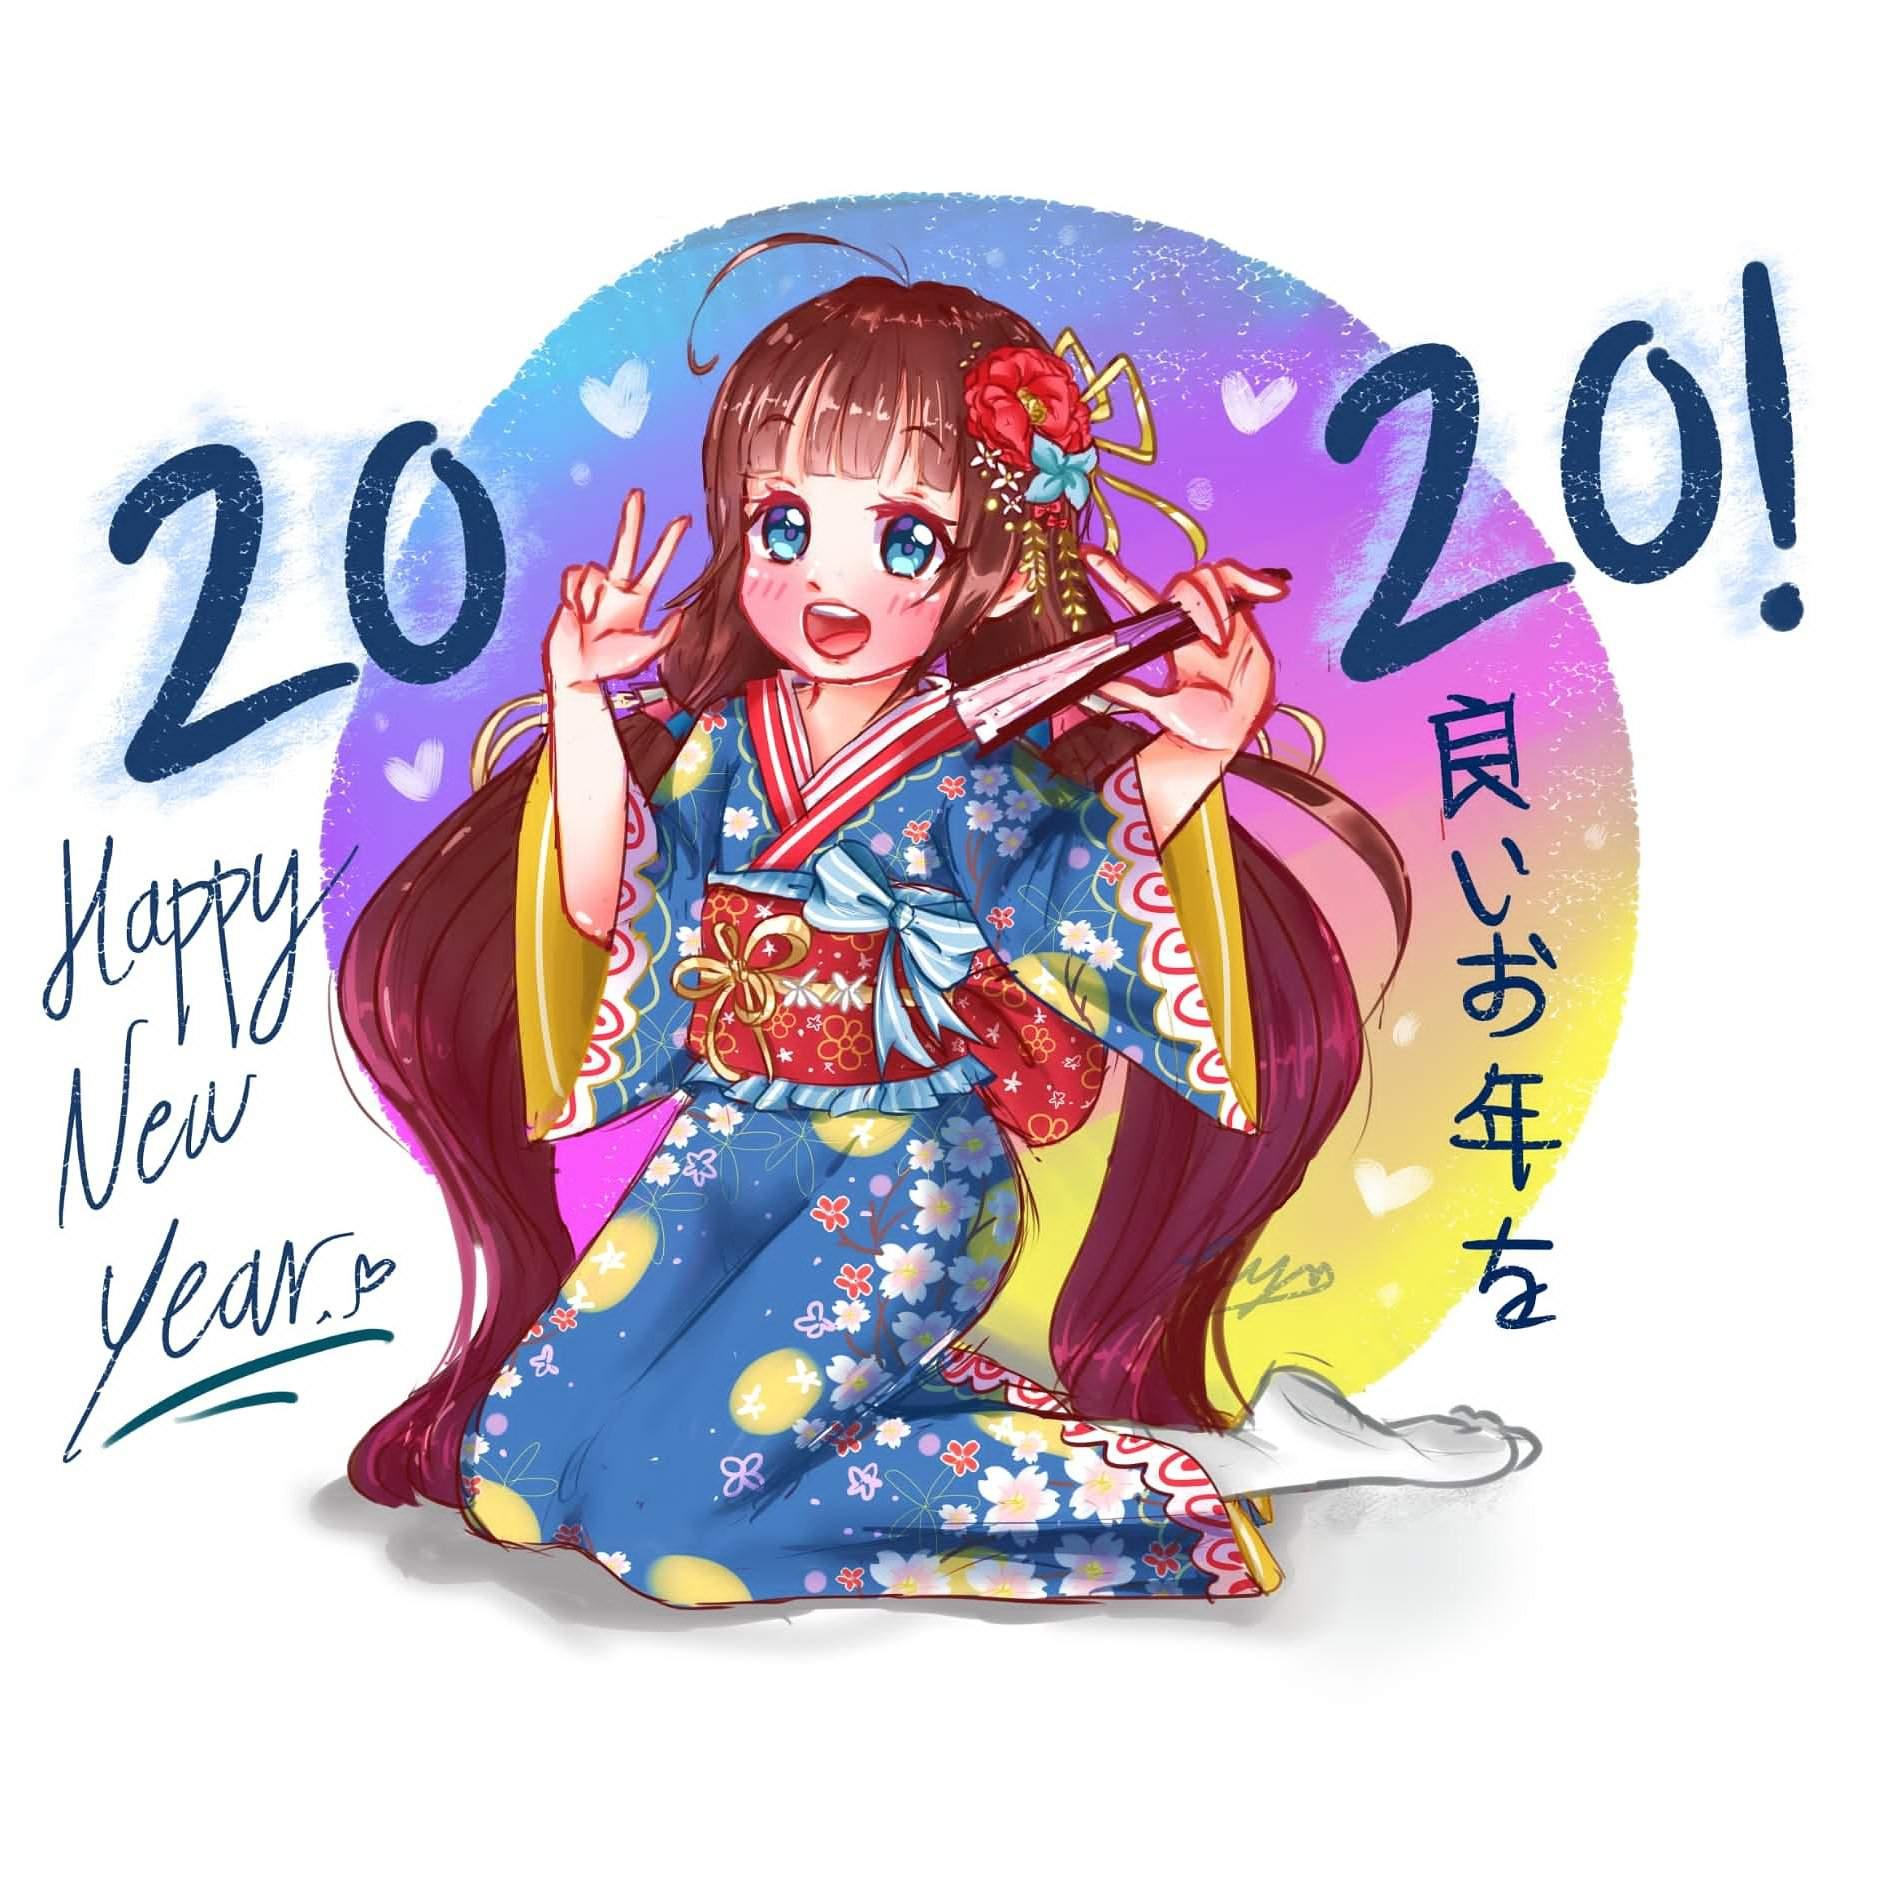 【Speedpaint Sai】 Happy New Year 2020♥ | Arte Anime Amino Amino